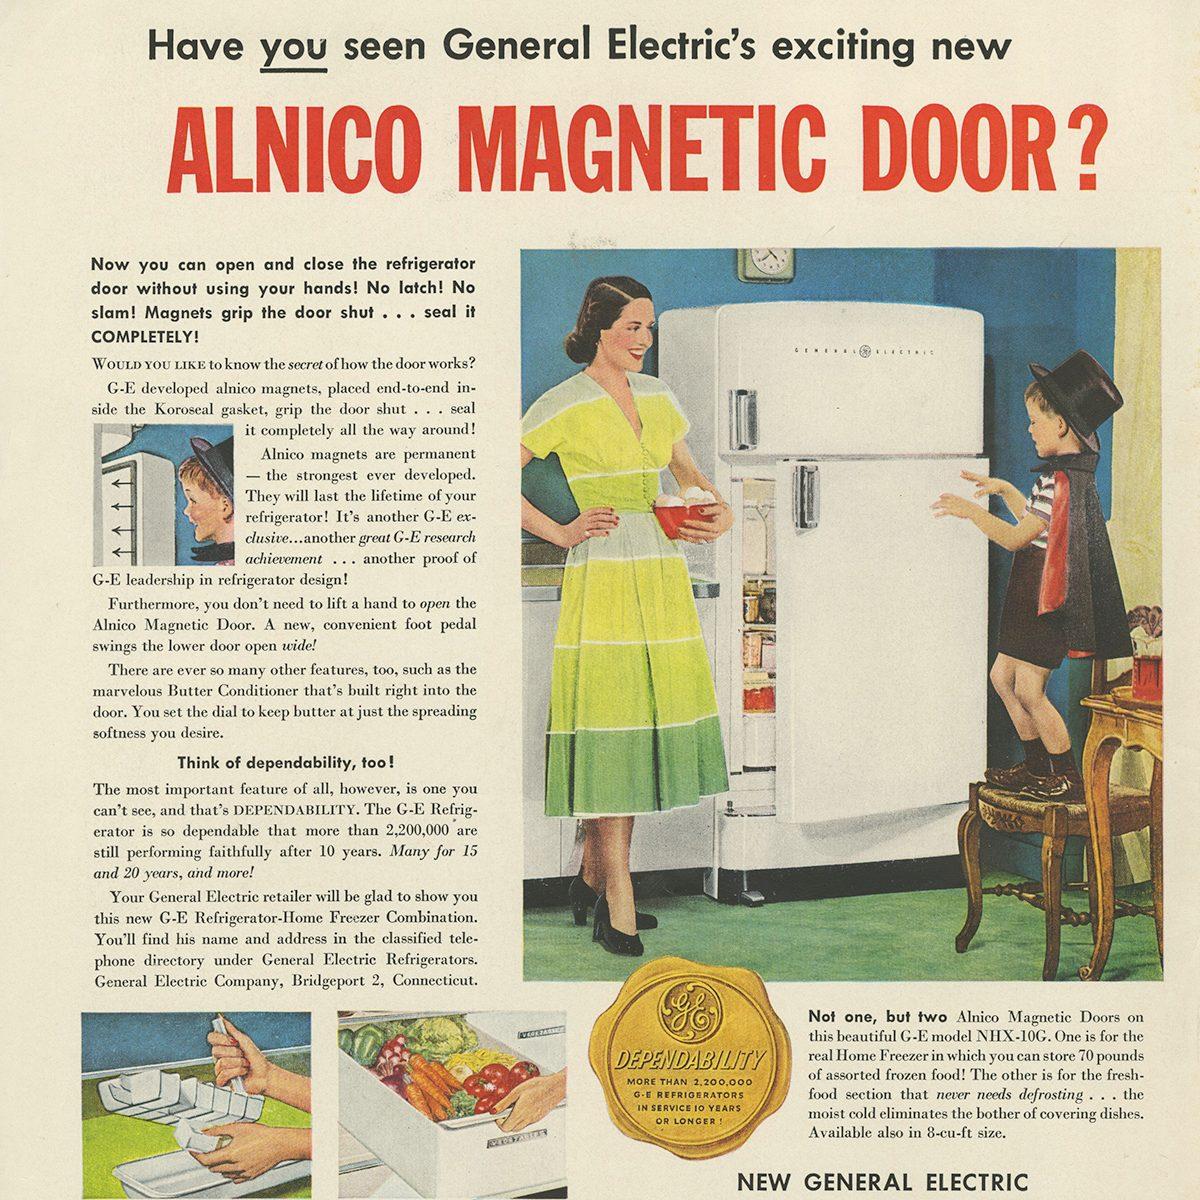 General Electric Refrigerator-Home Freezer